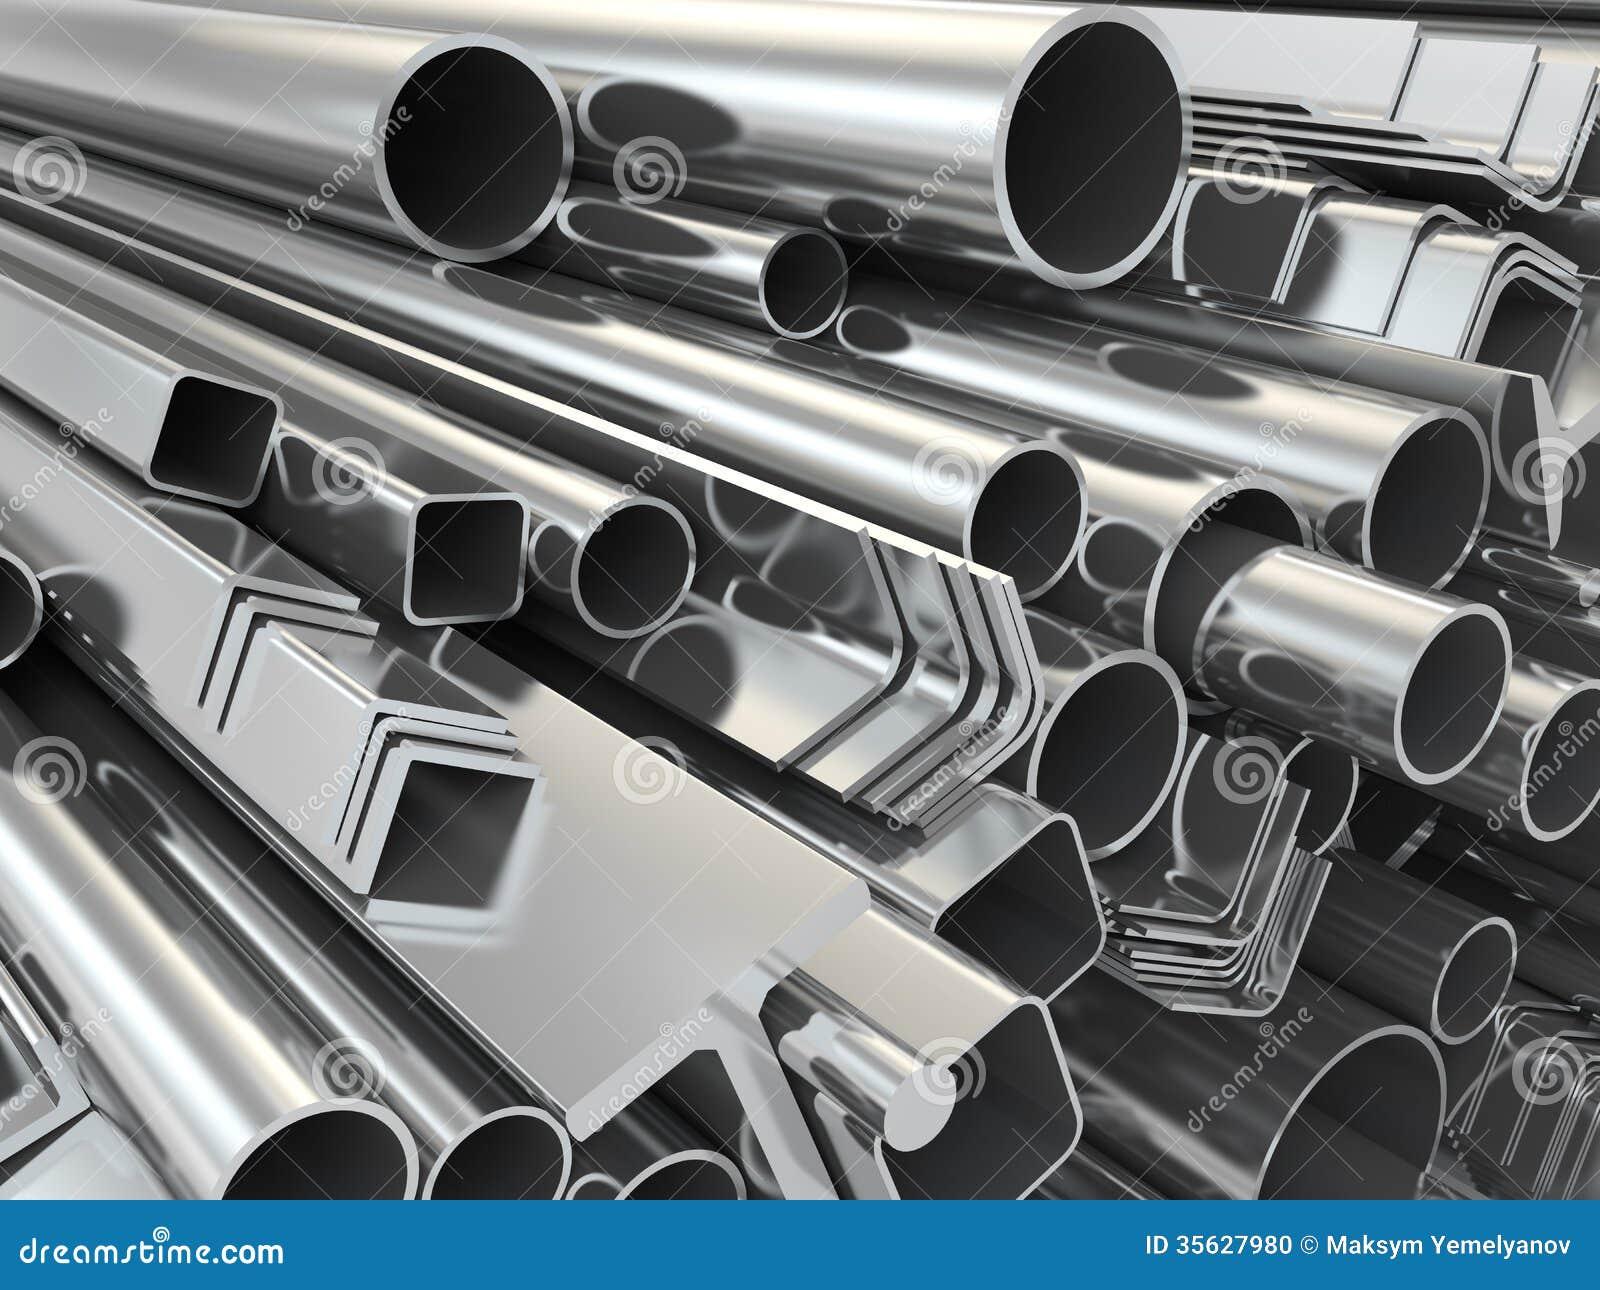 metal profile and pipes on white background stock illustration illustration of chrome. Black Bedroom Furniture Sets. Home Design Ideas